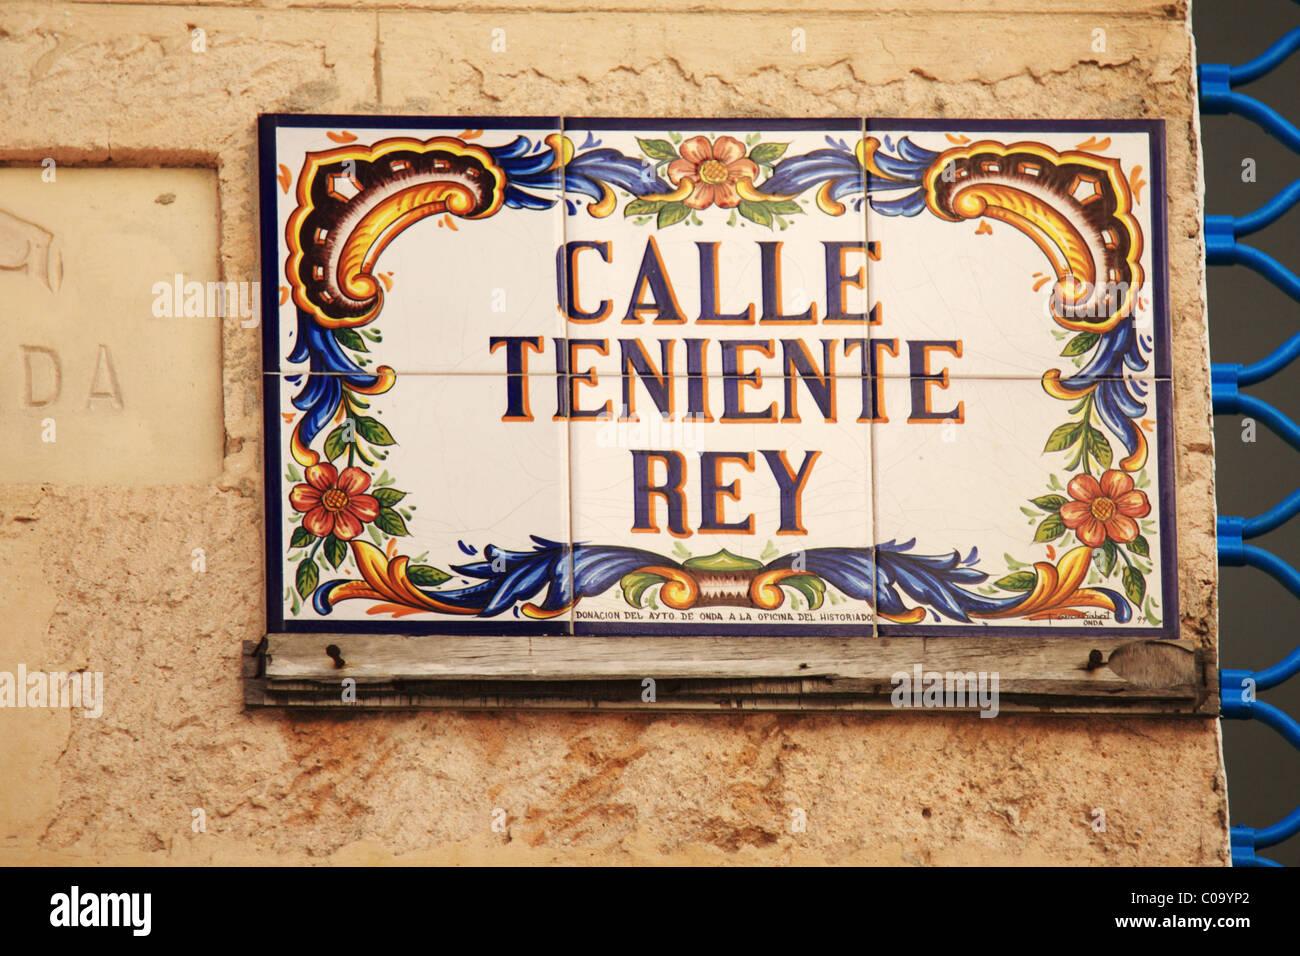 Sign for Calla Teniente Rey in Havana, Cuba - Stock Image